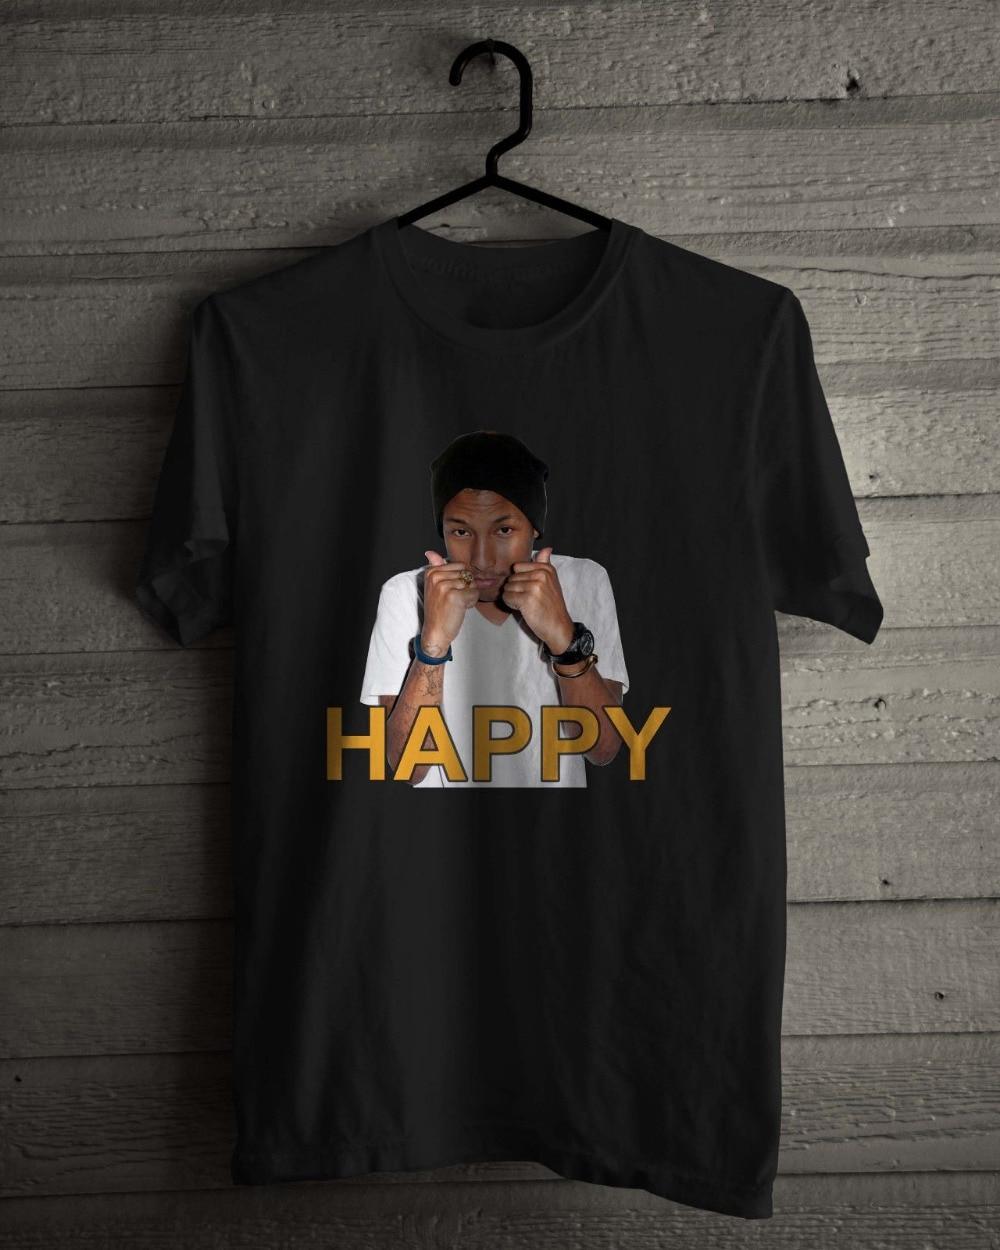 5e9cea8074 Black Style Men'S Fashion Crew Neck Pharrell William, American Singer  Rapper, Happy Black And. US $11.03. T Shirt ...